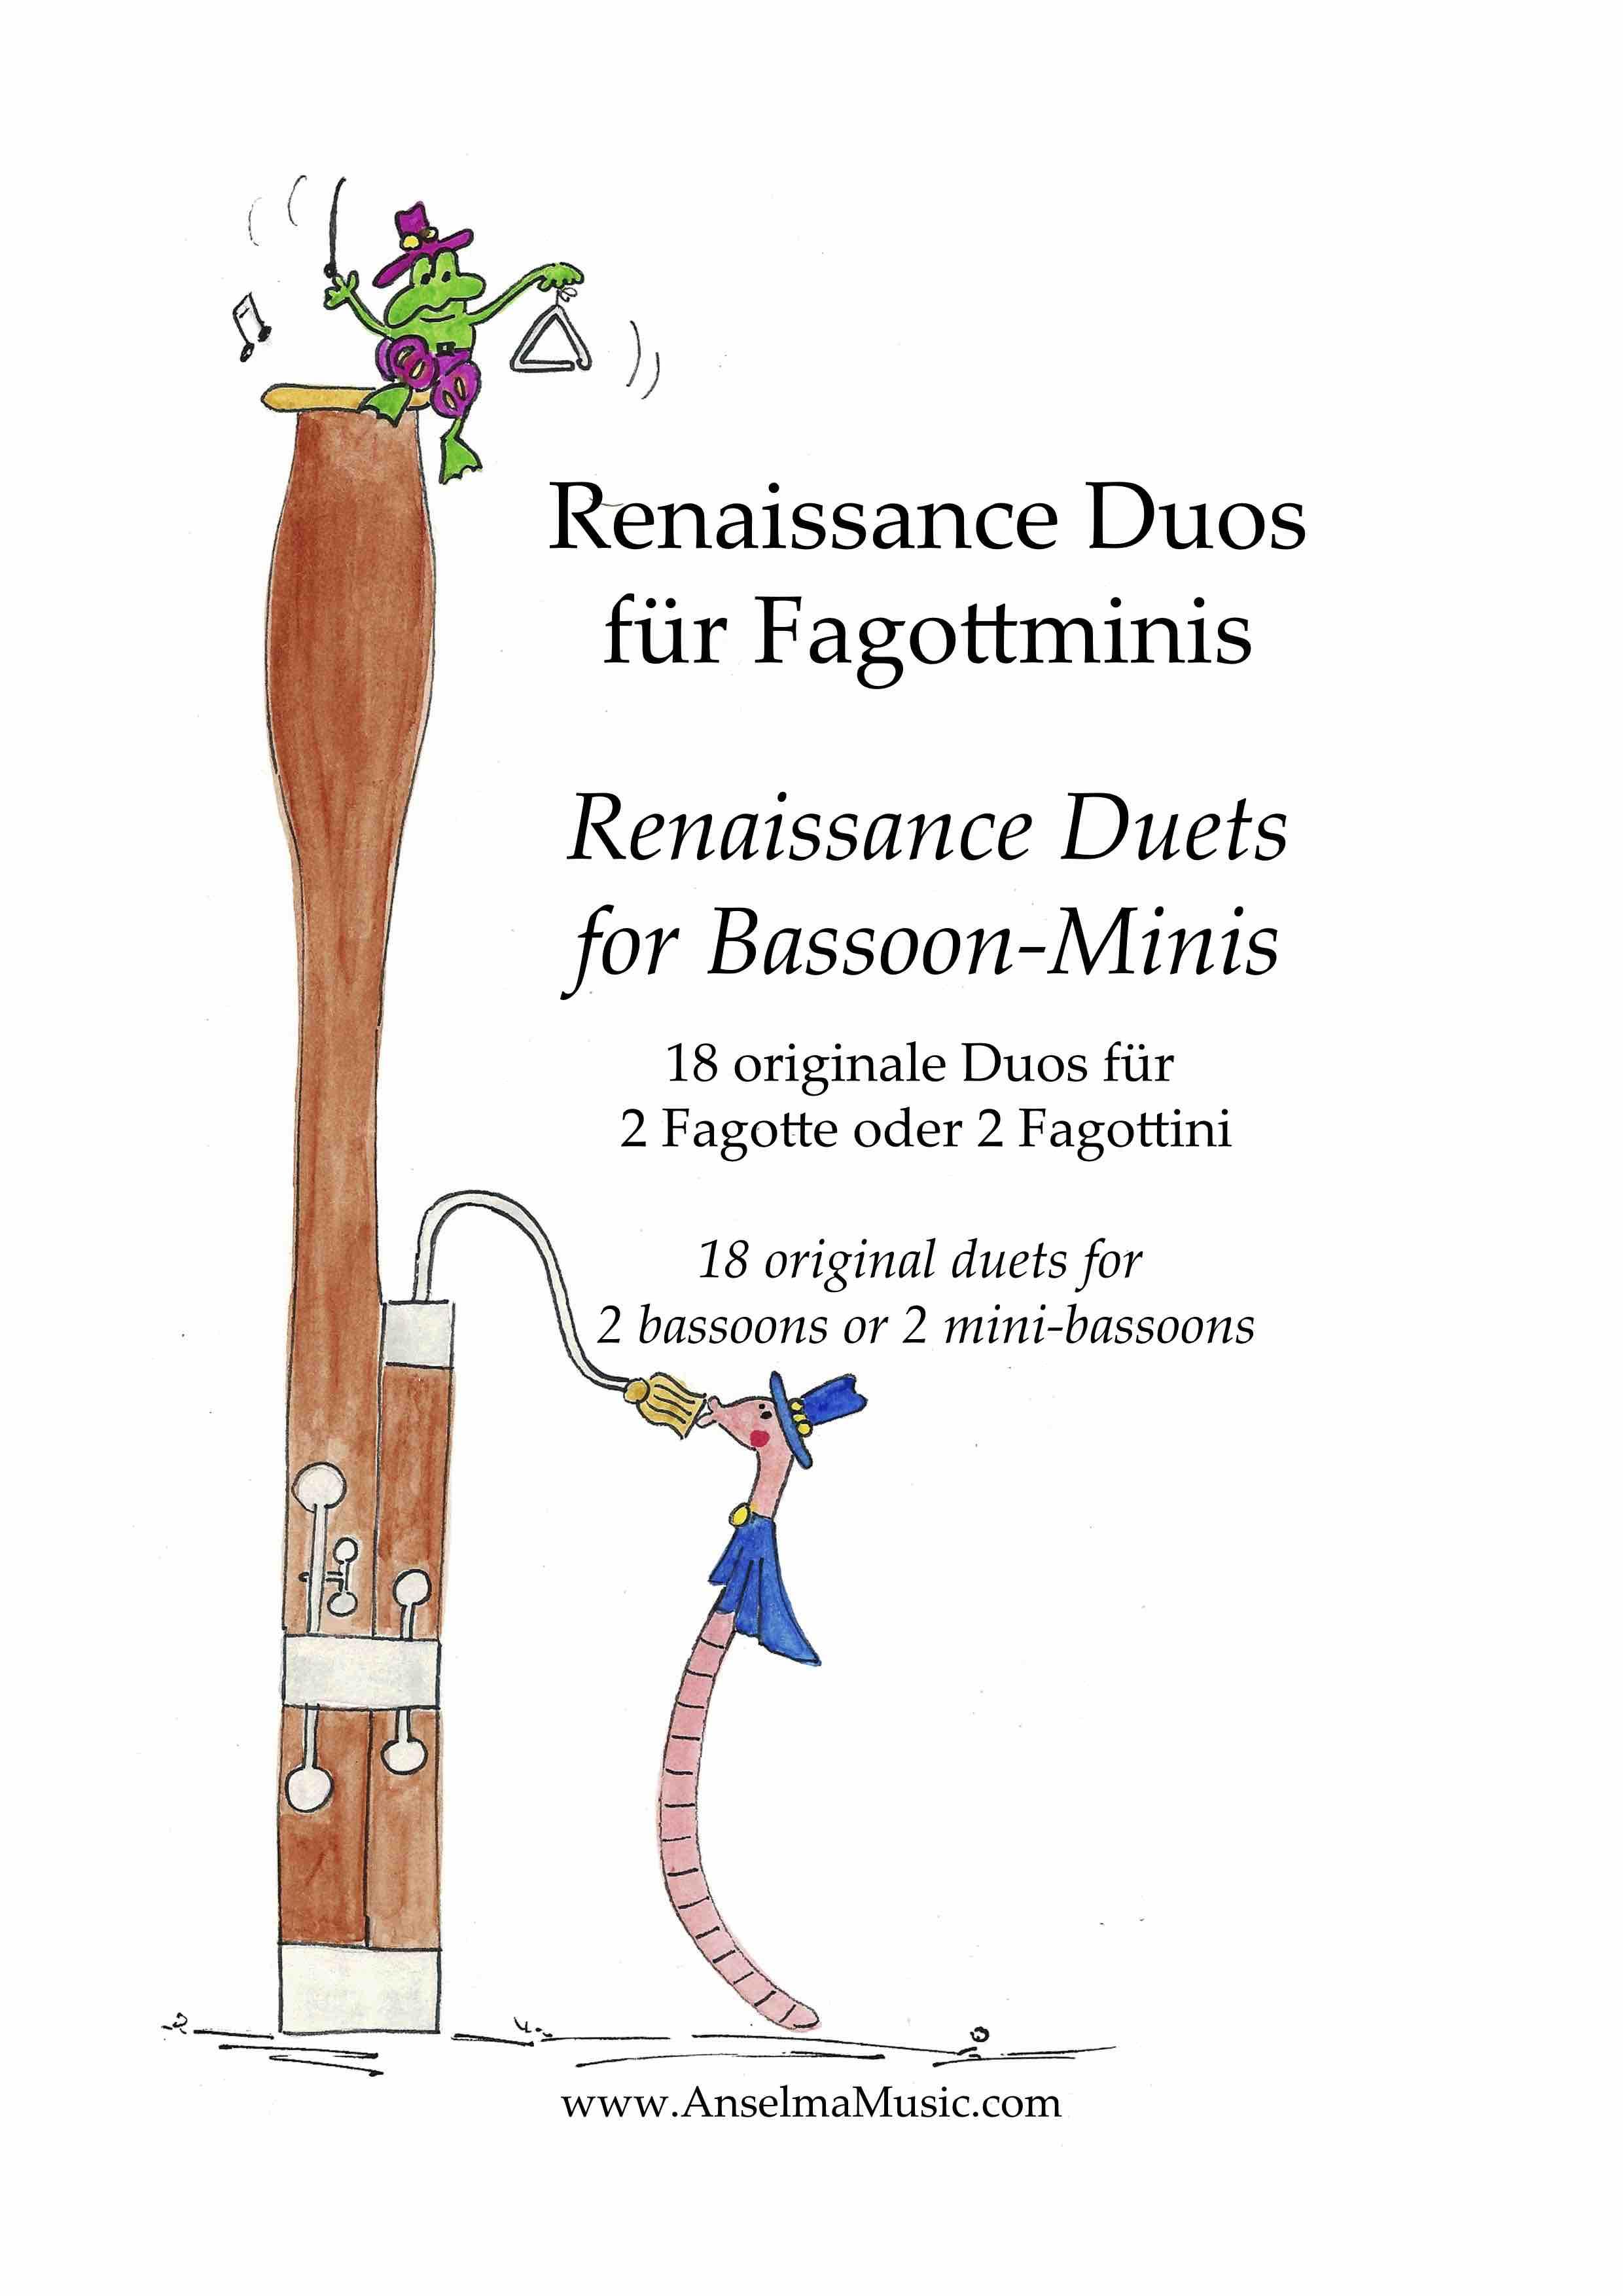 Renaissance Duos fuer Fagottminis Fagott Duo Fagottino Duo Bassoon Duet